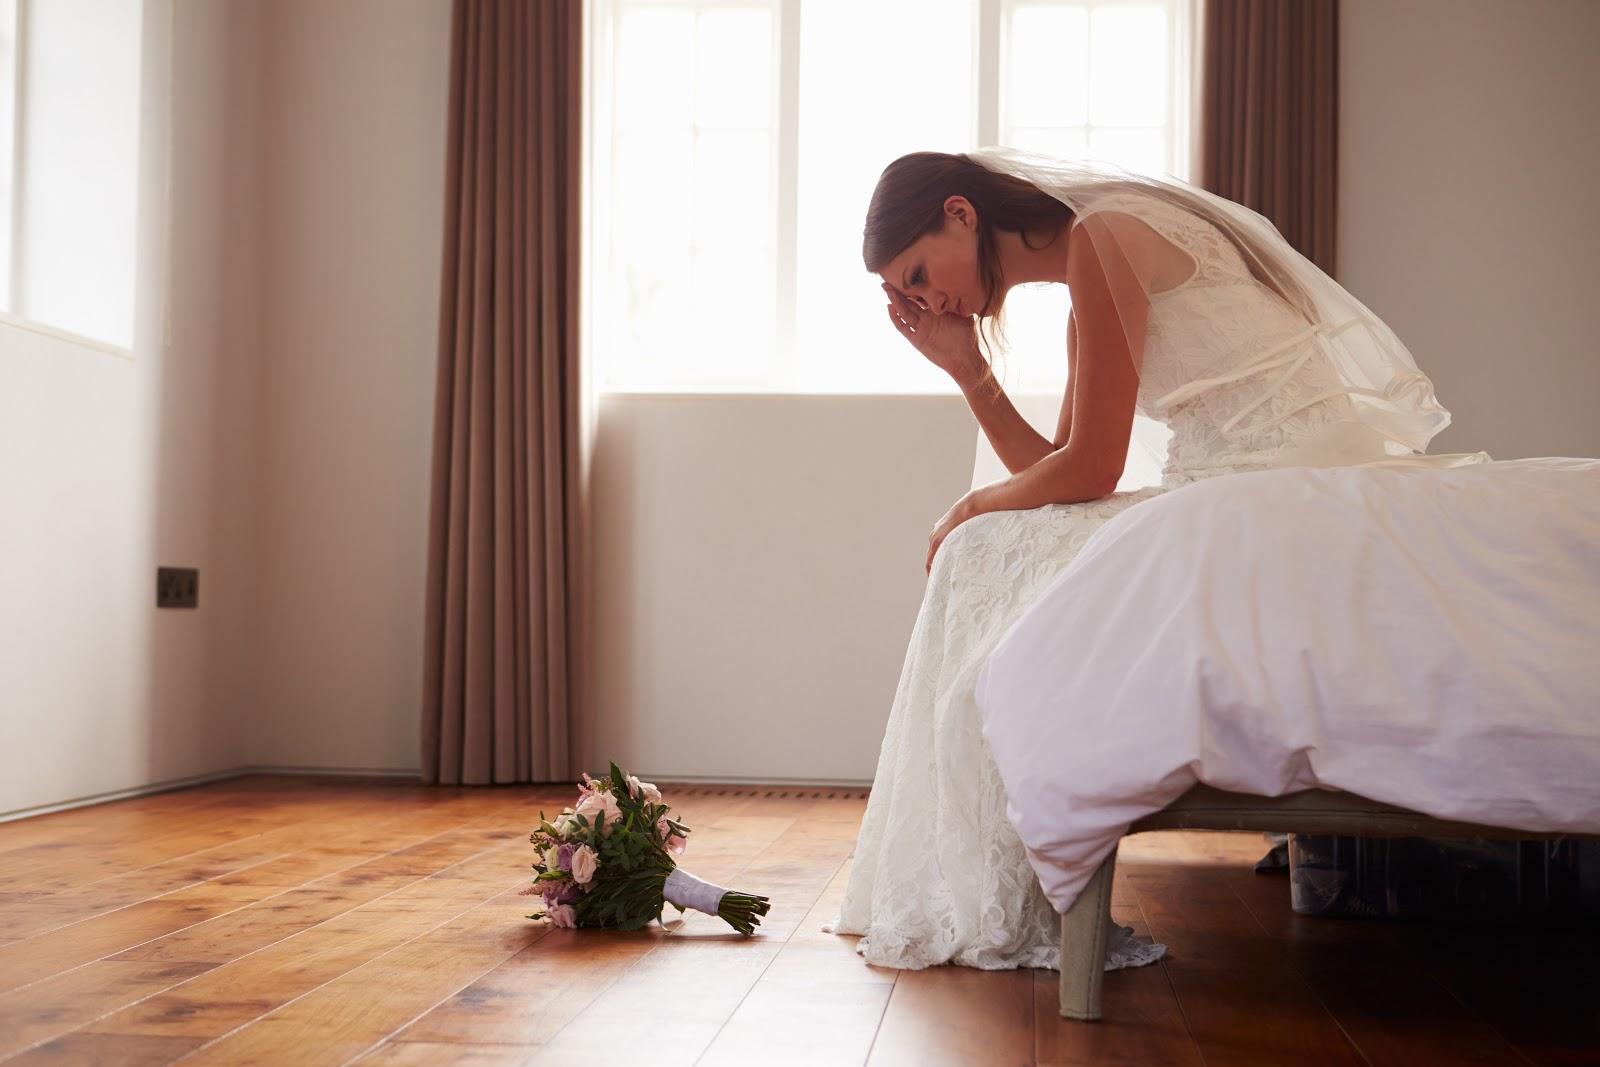 Wedding stress